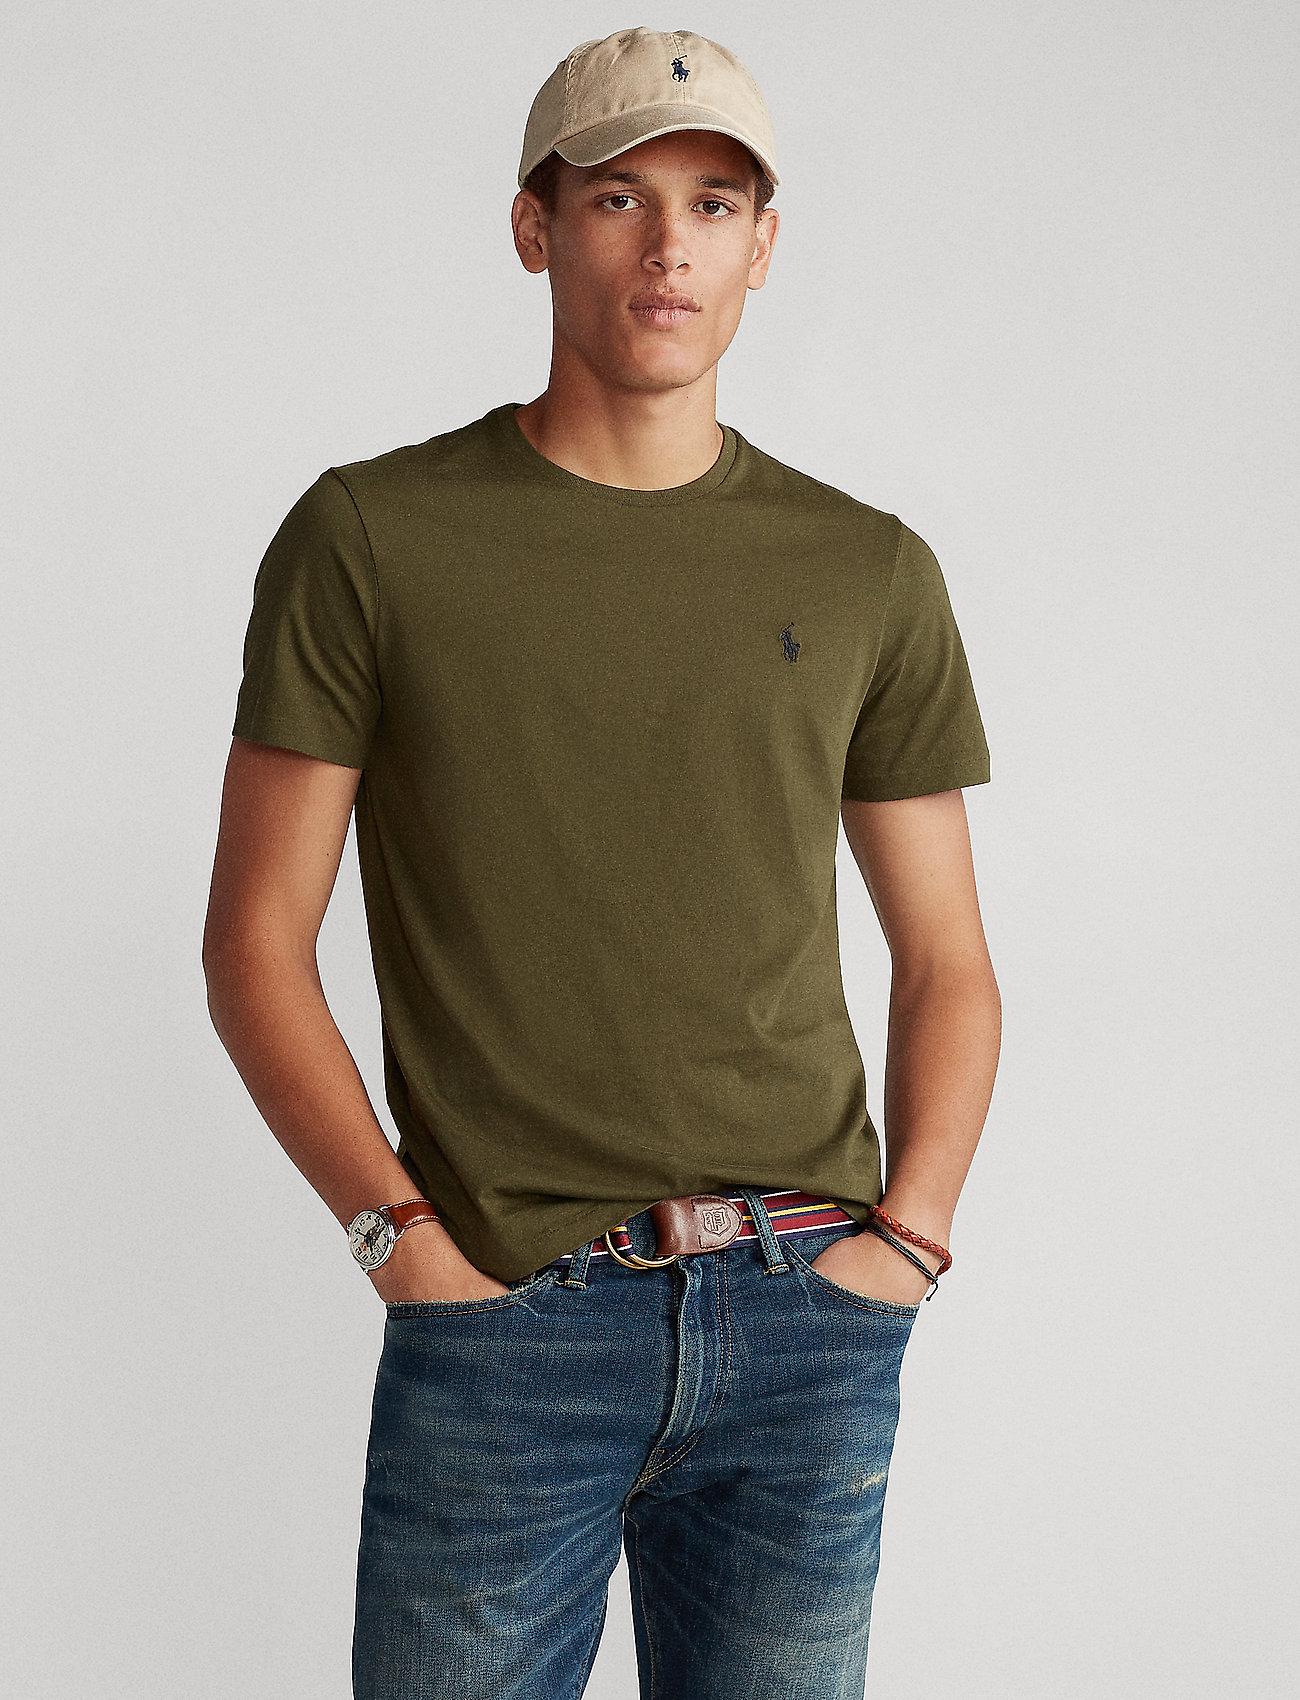 Polo Ralph Lauren Big & Tall - Classic Fit Crewneck Tee - basic t-shirts - company olive/c97 - 0